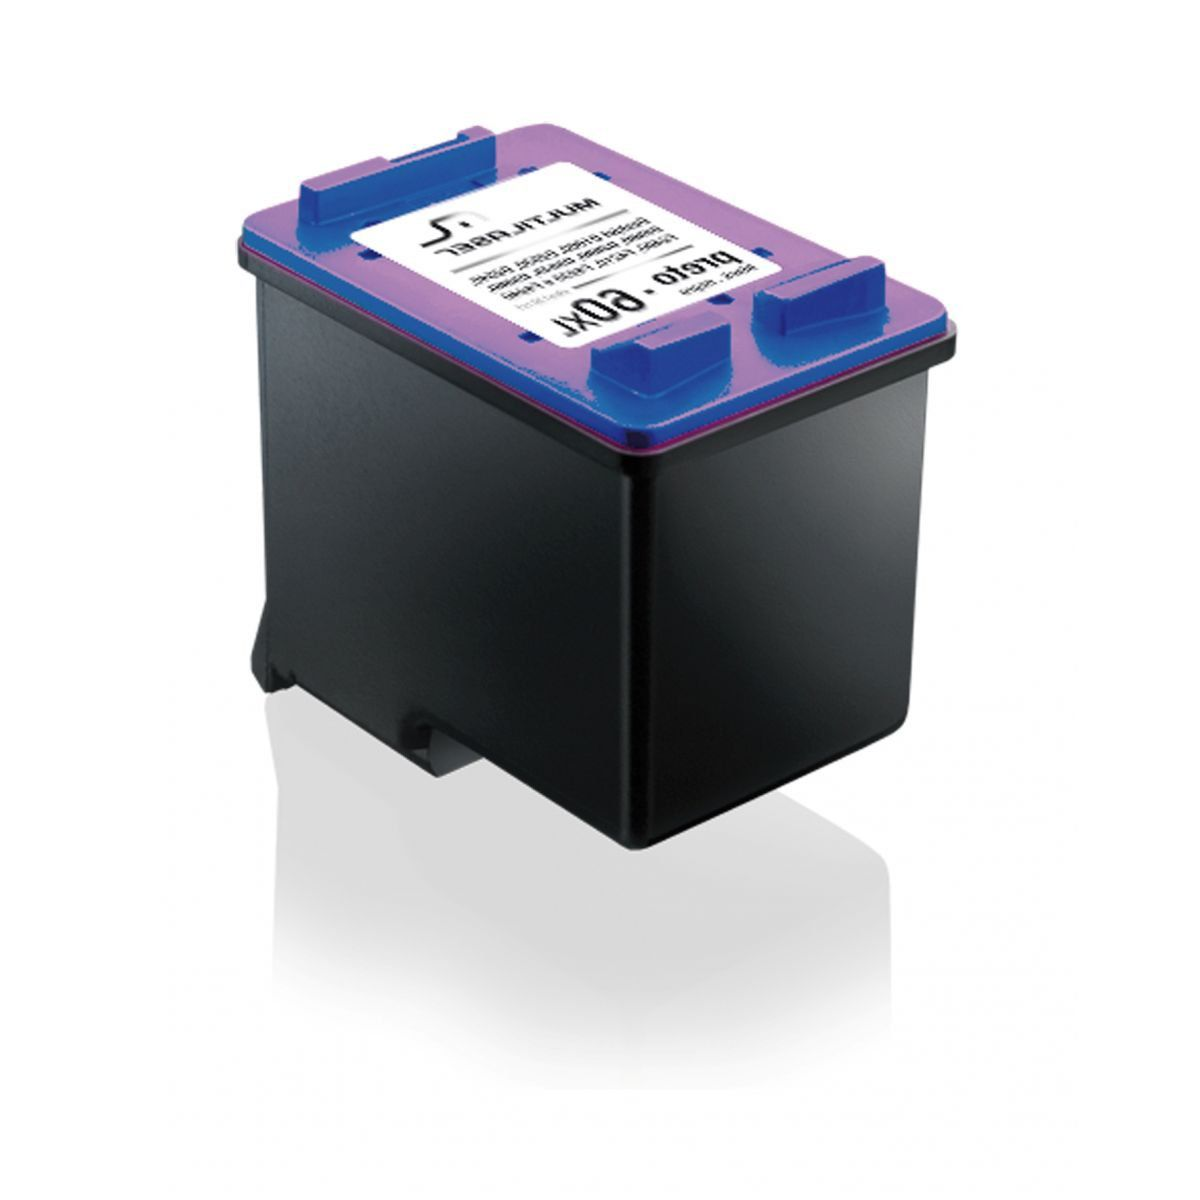 Cartucho Impressora Comp. P/ Hp Mod.60 Preto Co60p